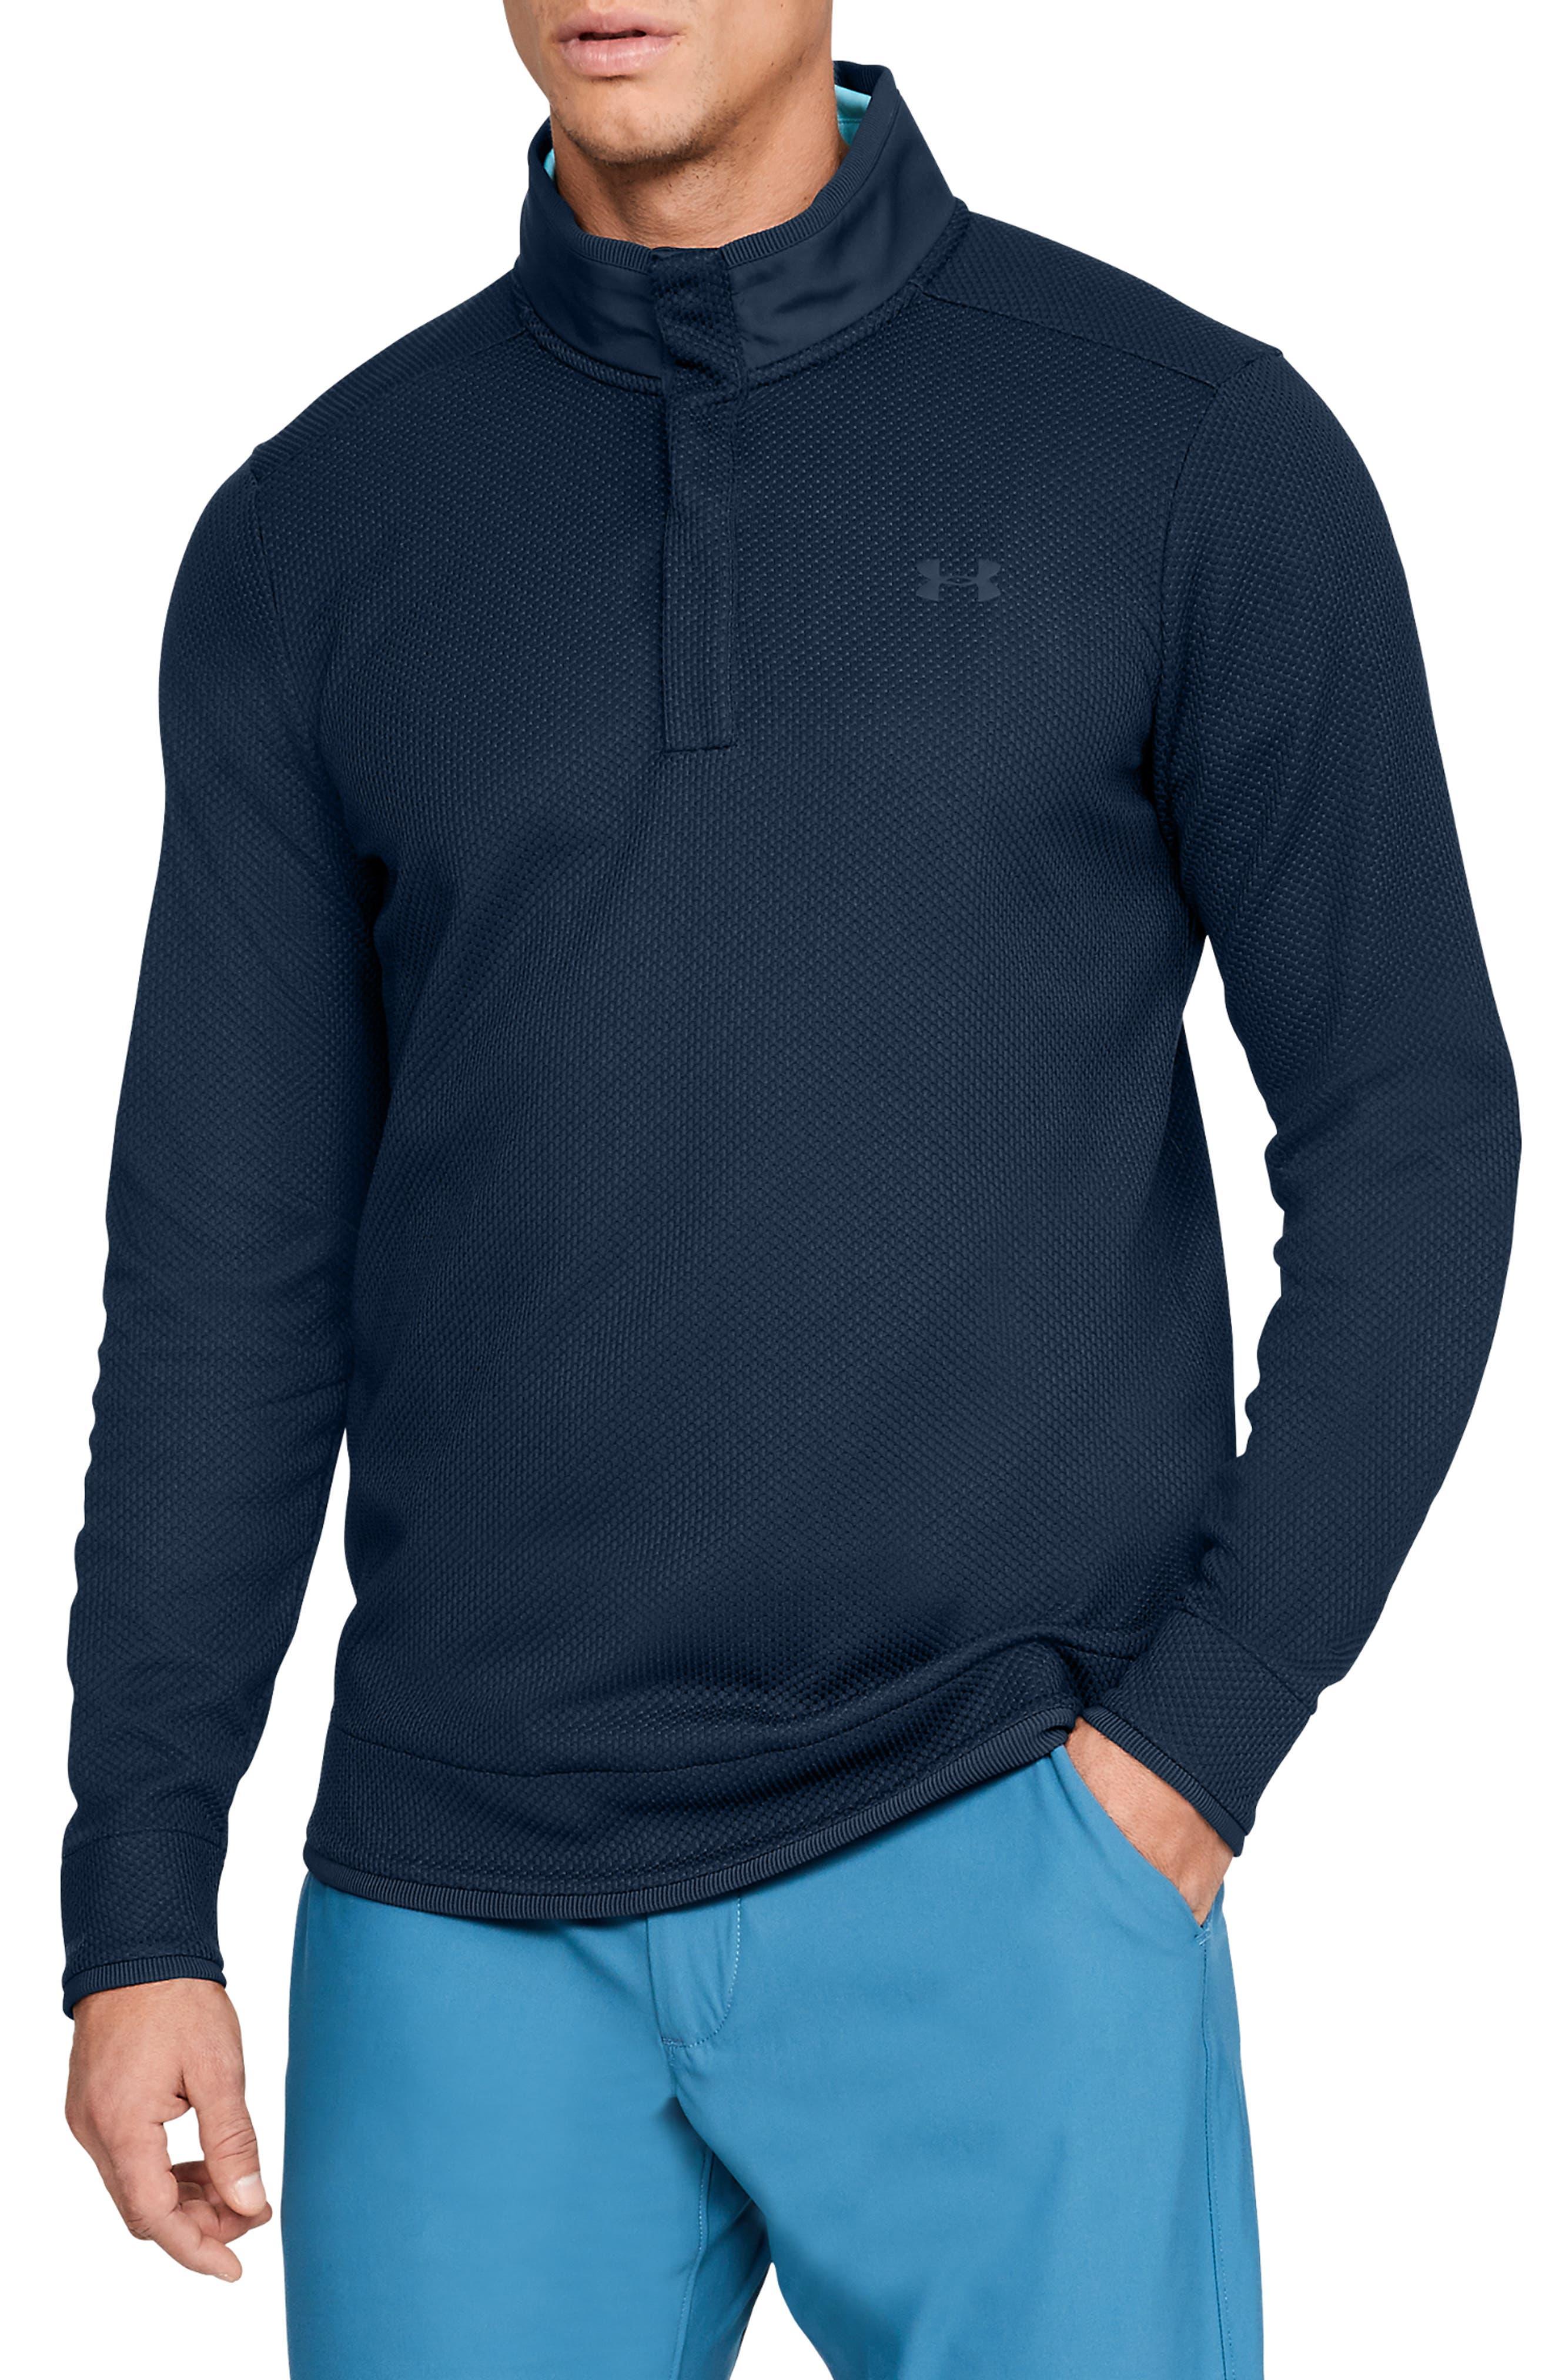 Under Armour Storm Sweaterfleece Snap Mock Neck Pullover, Blue